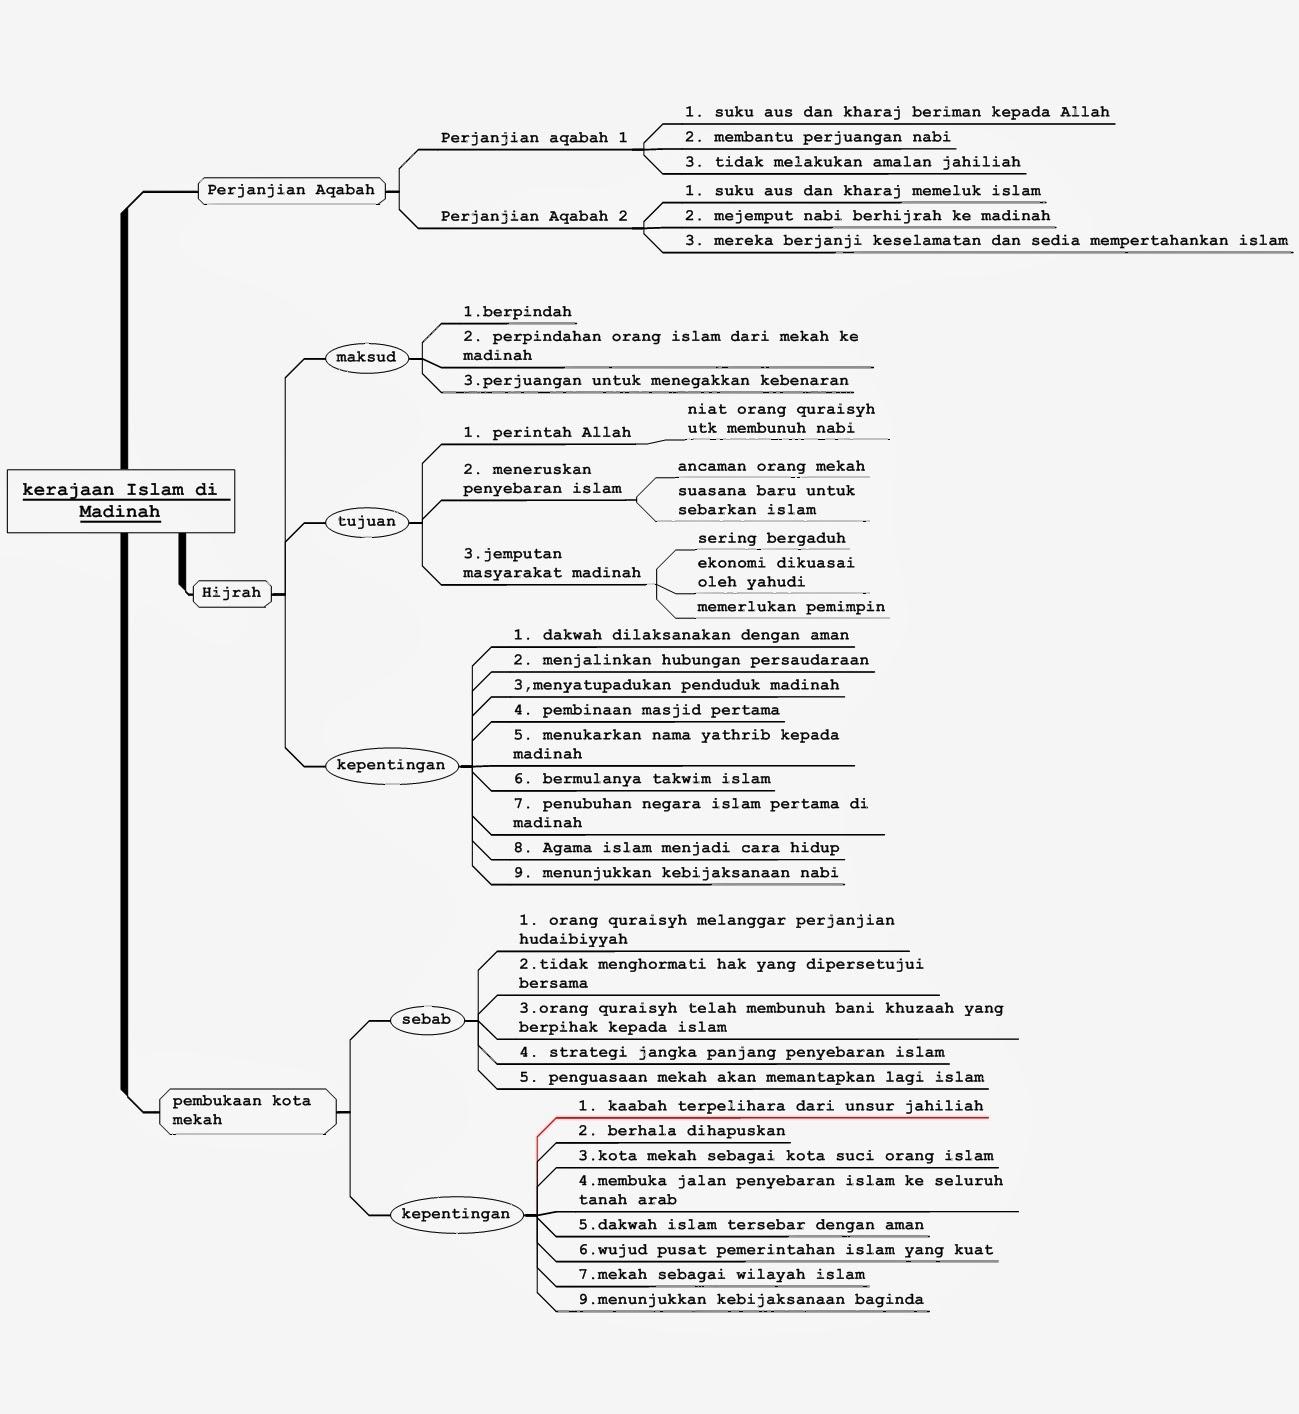 Sejarah Smkdpb New Peta Minda Bab 5 Tingkatan 4